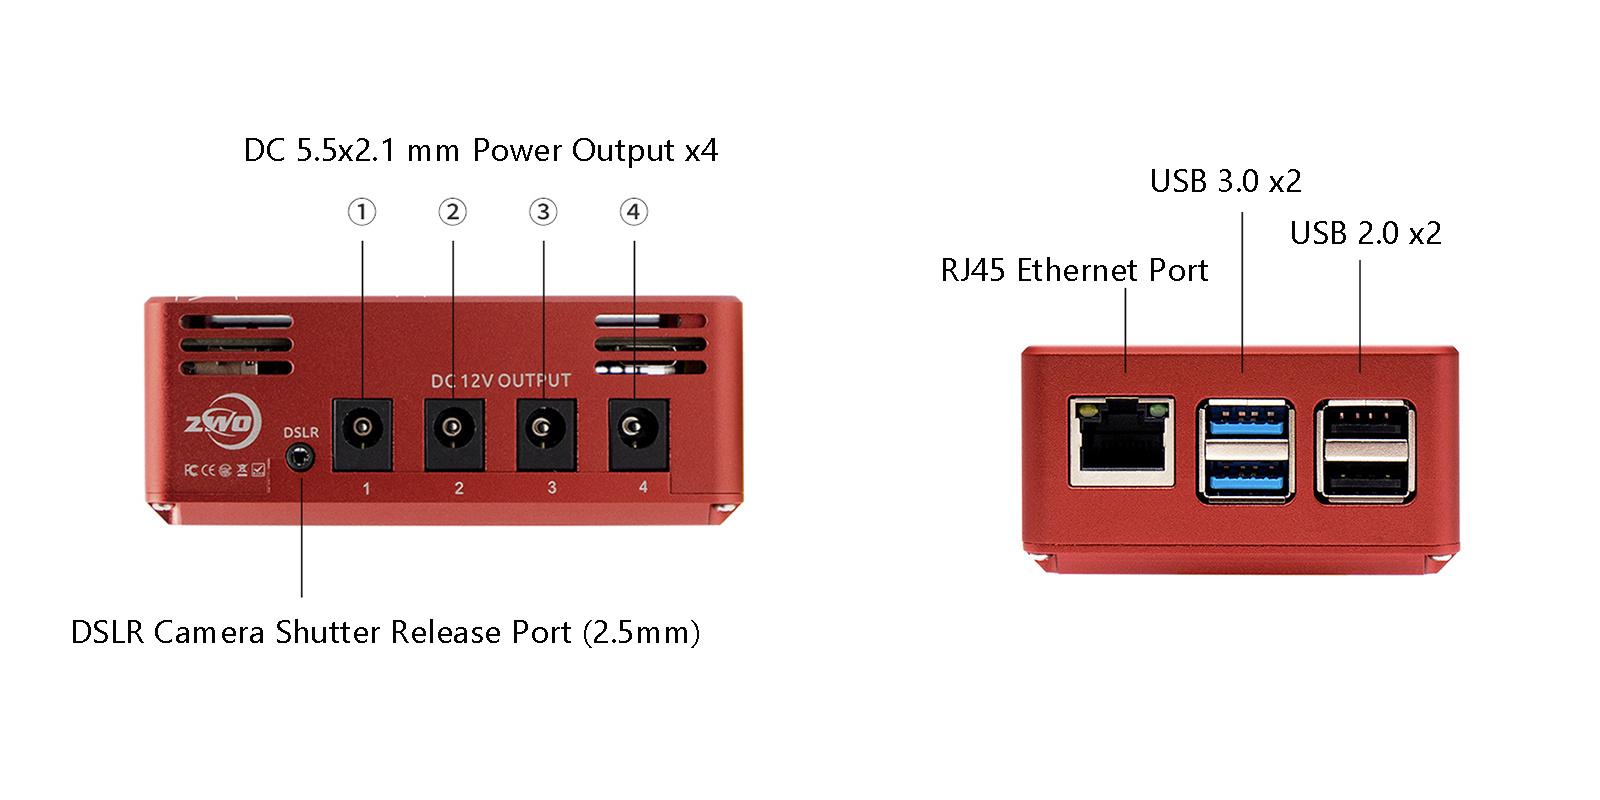 ASIAIR-Pro-multiple-port.jpg.9cef2f82da384bc9f1dfccacf5a26d13.jpg